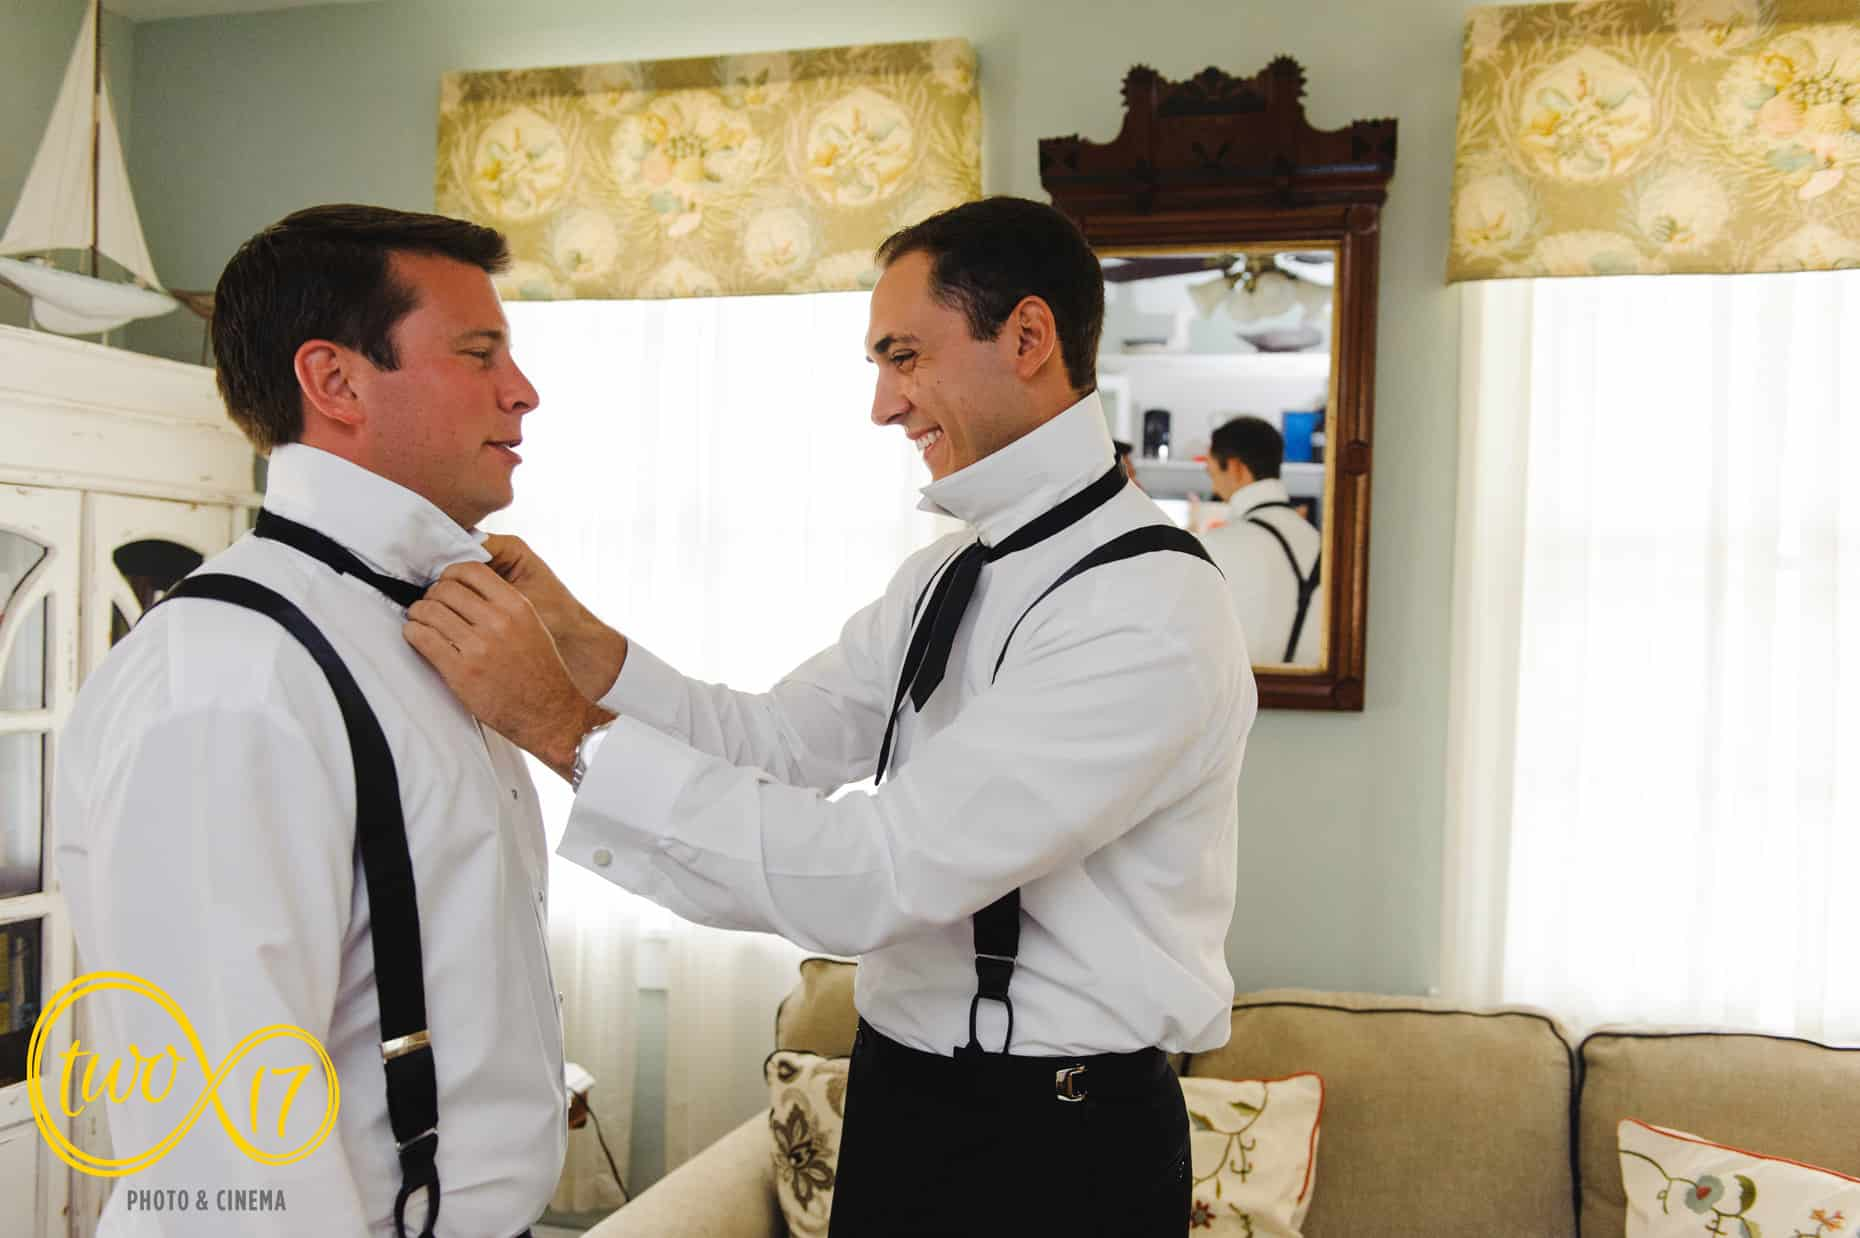 Photo Journalistic wedding photographers New Jersey